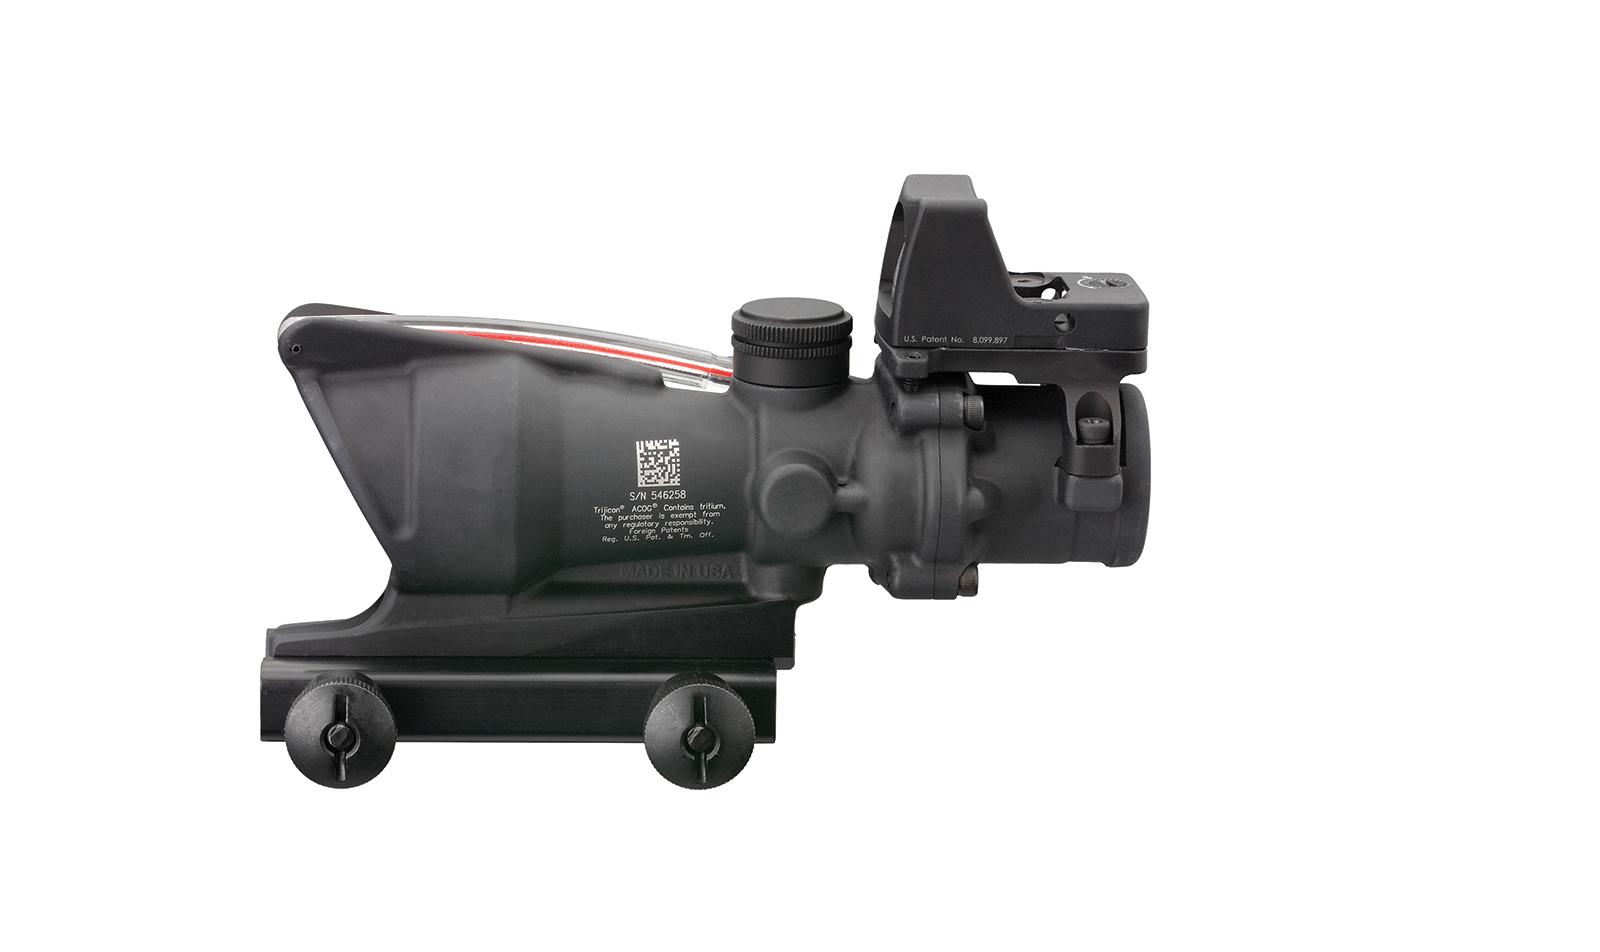 TA31-C-100550 angle 2